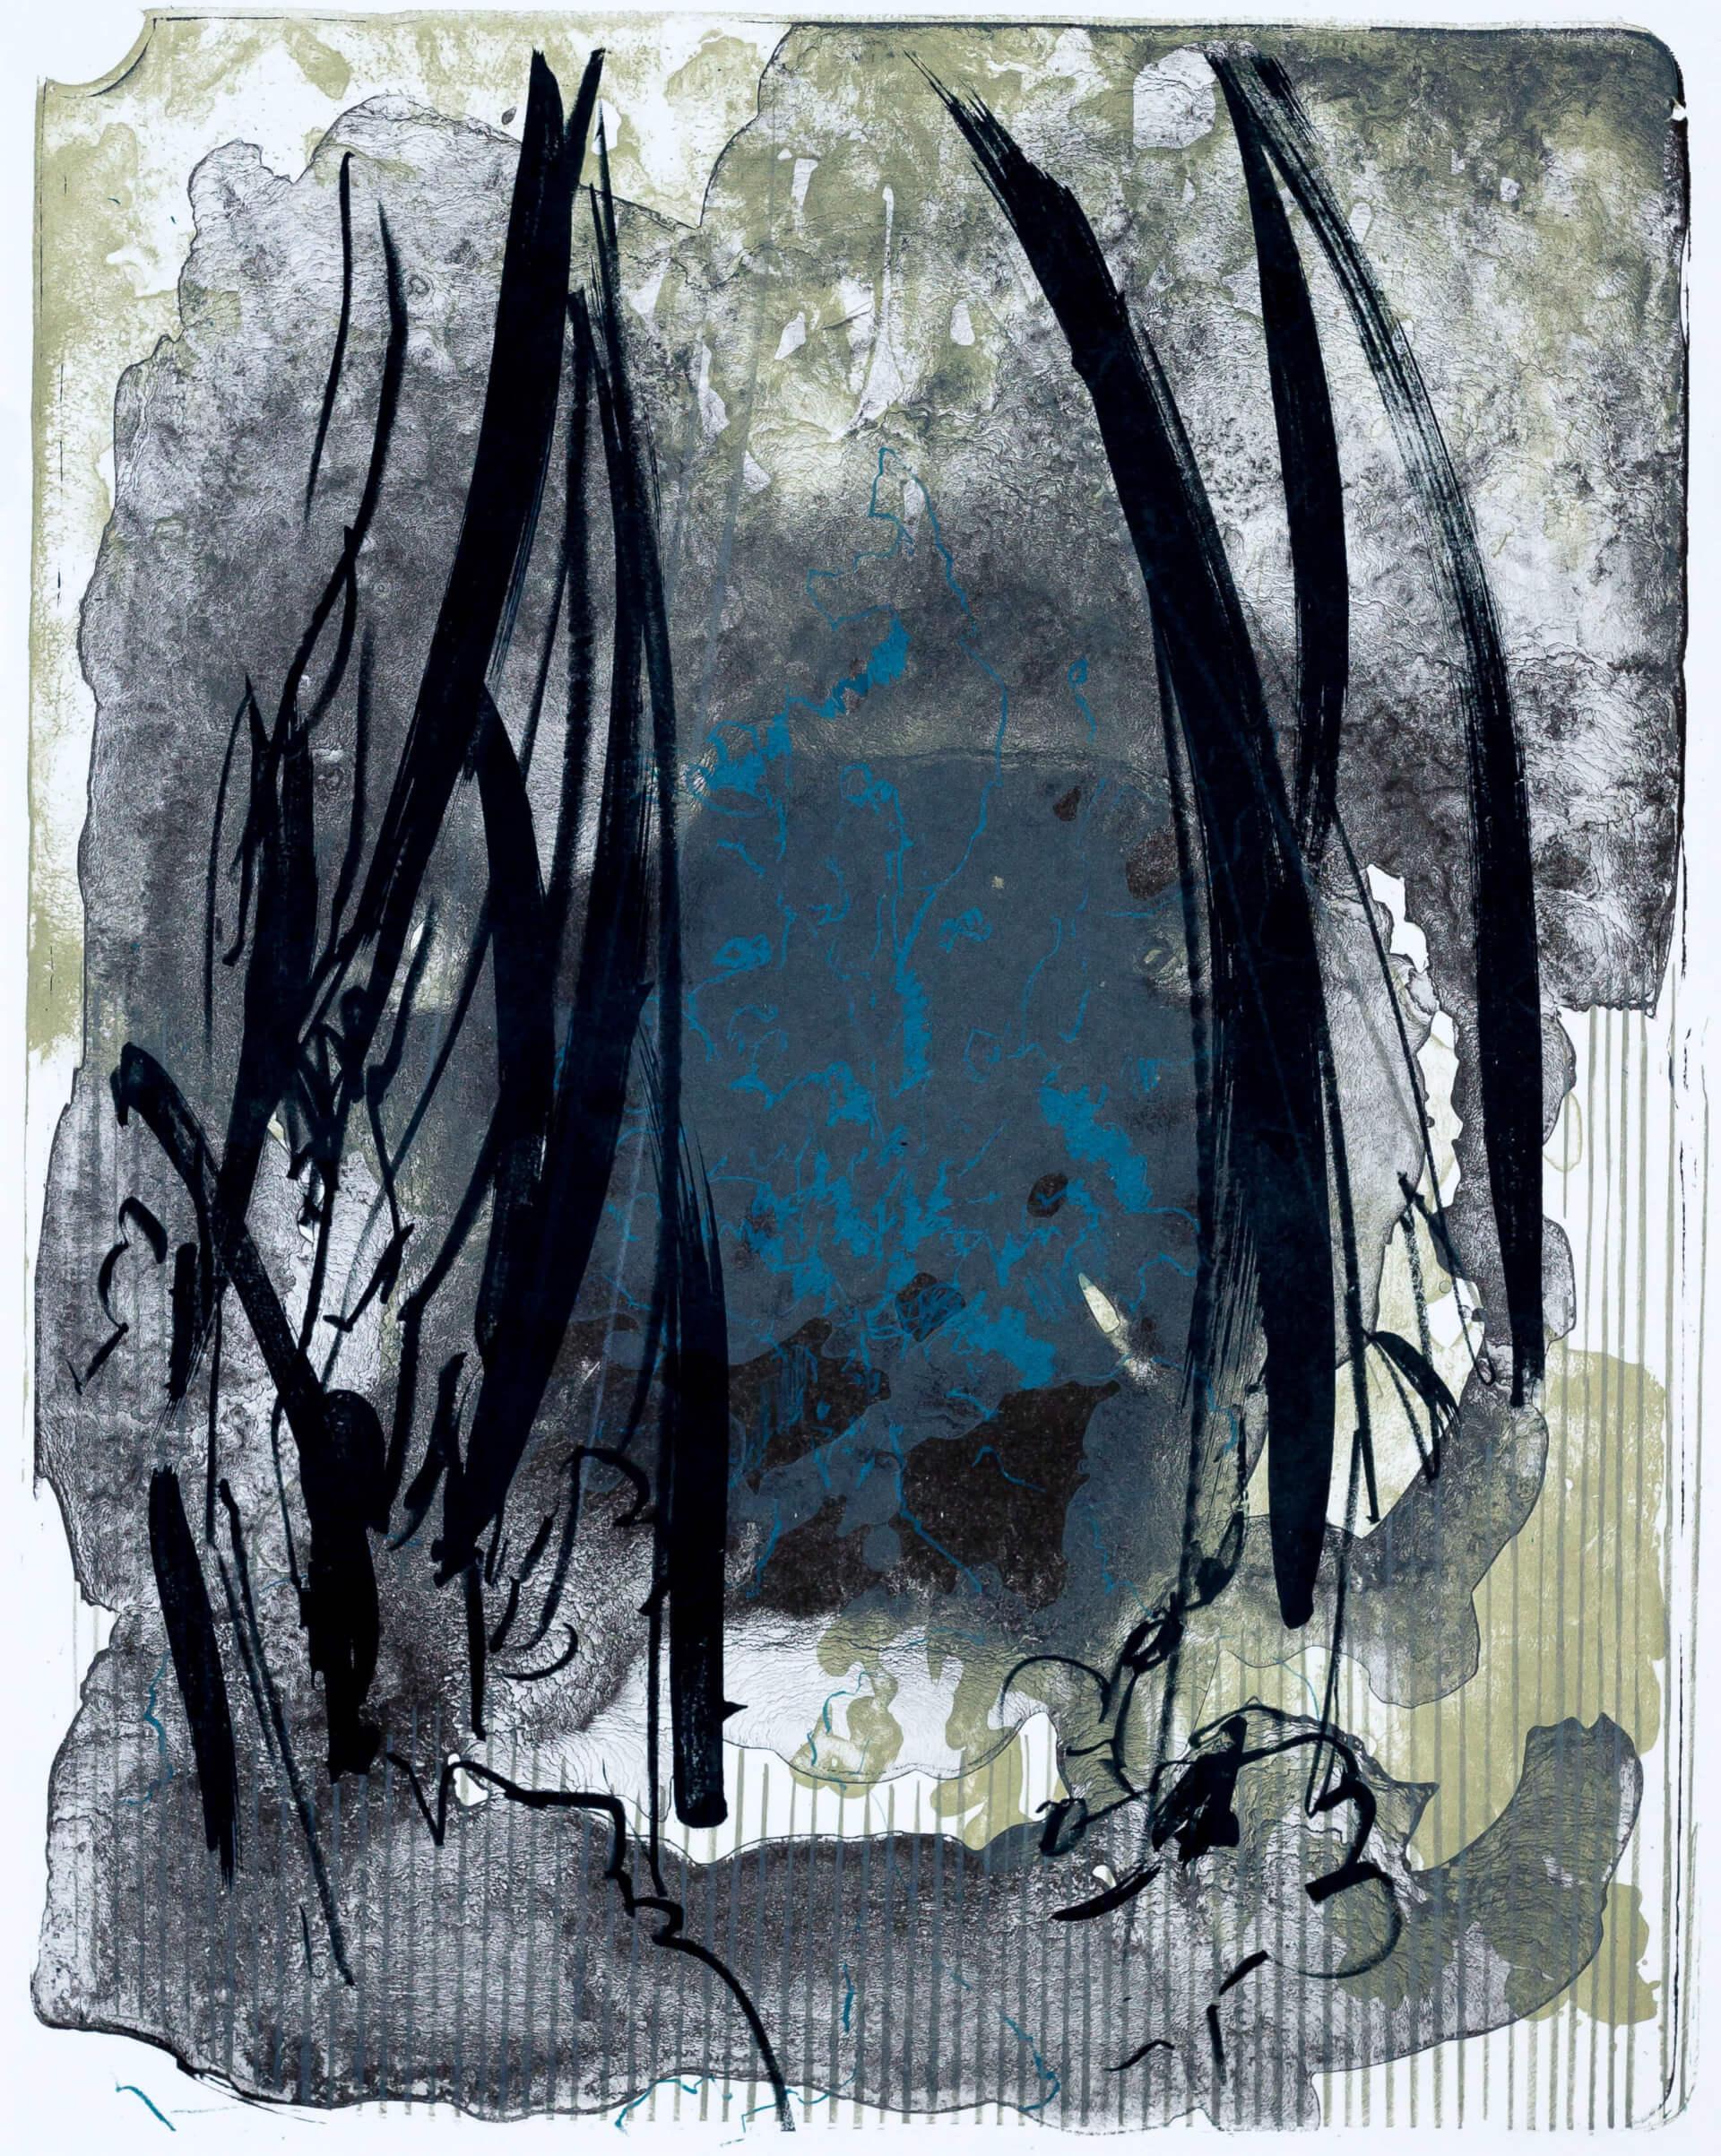 Katharina Albers, organism (Wald) V, 2016, Farblithographie, Unikat, 50x40 cm